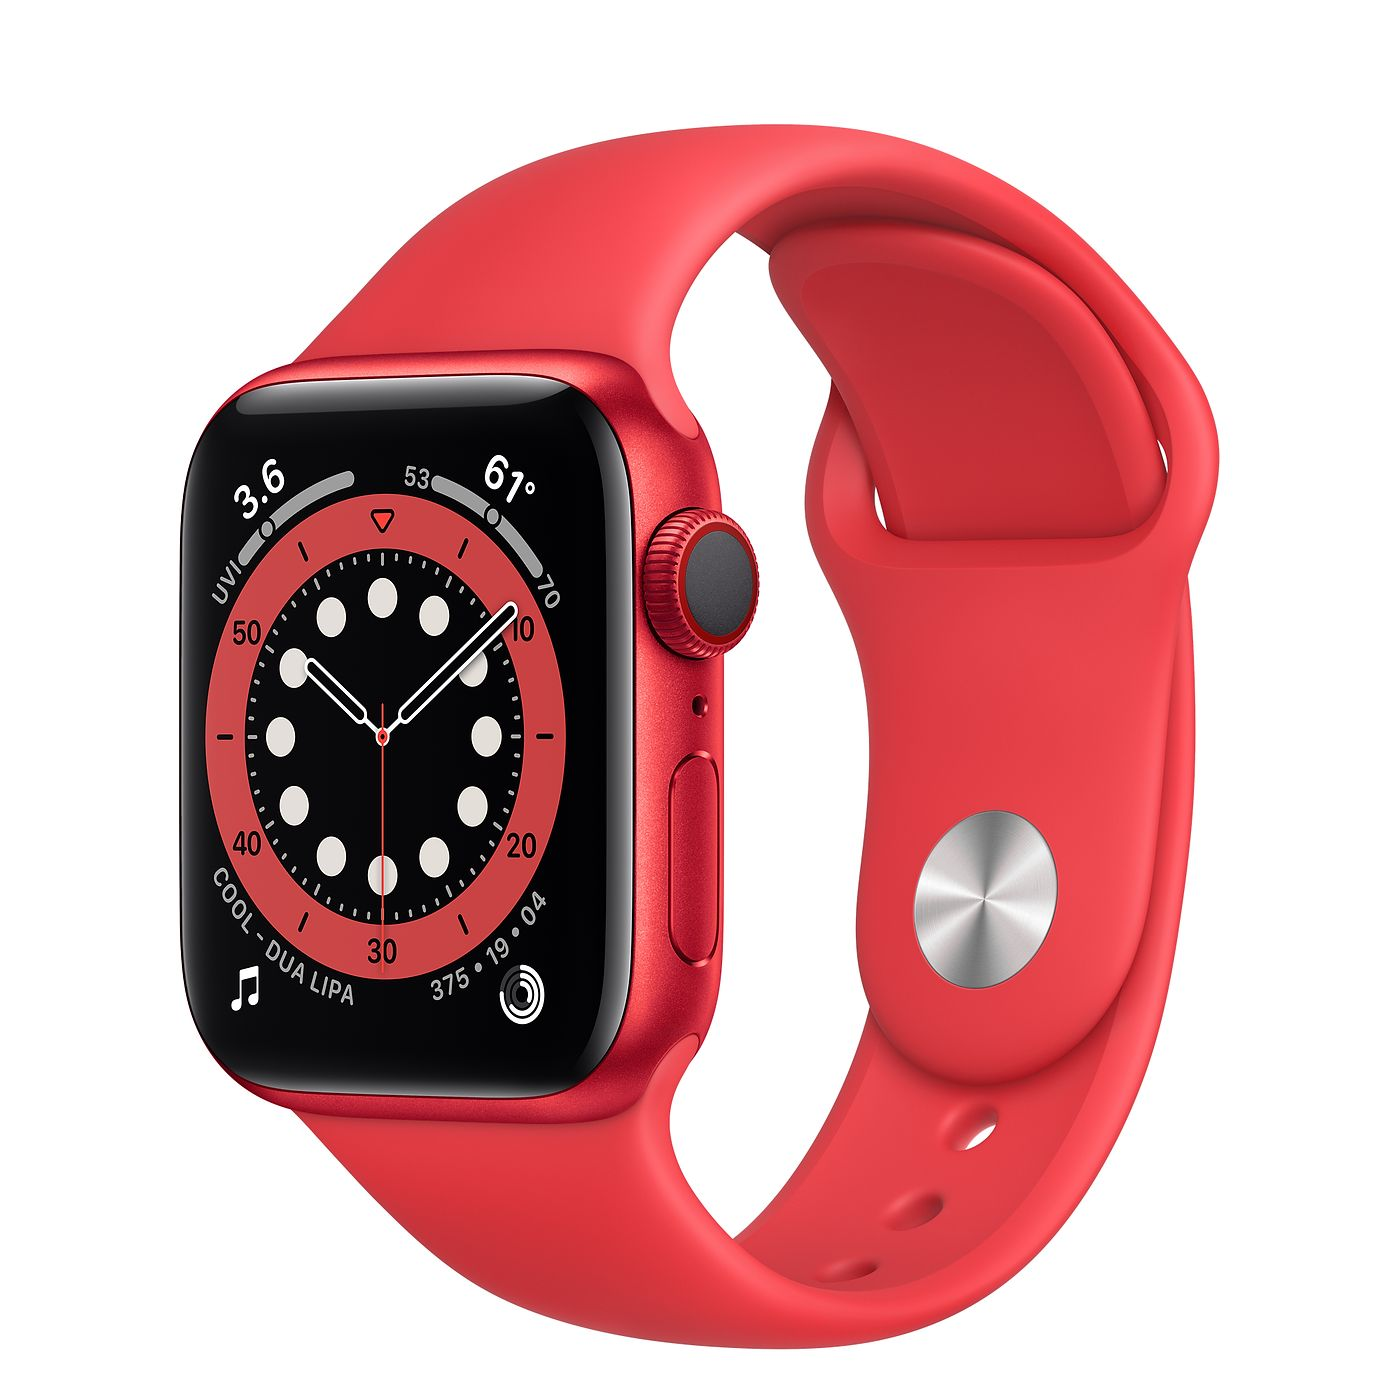 Apple 2020년 애플워치 6, GPS+Cellular, (PRODUCT)RED 알루미늄 케이스, (PRODUCT)RED 스포츠 밴드